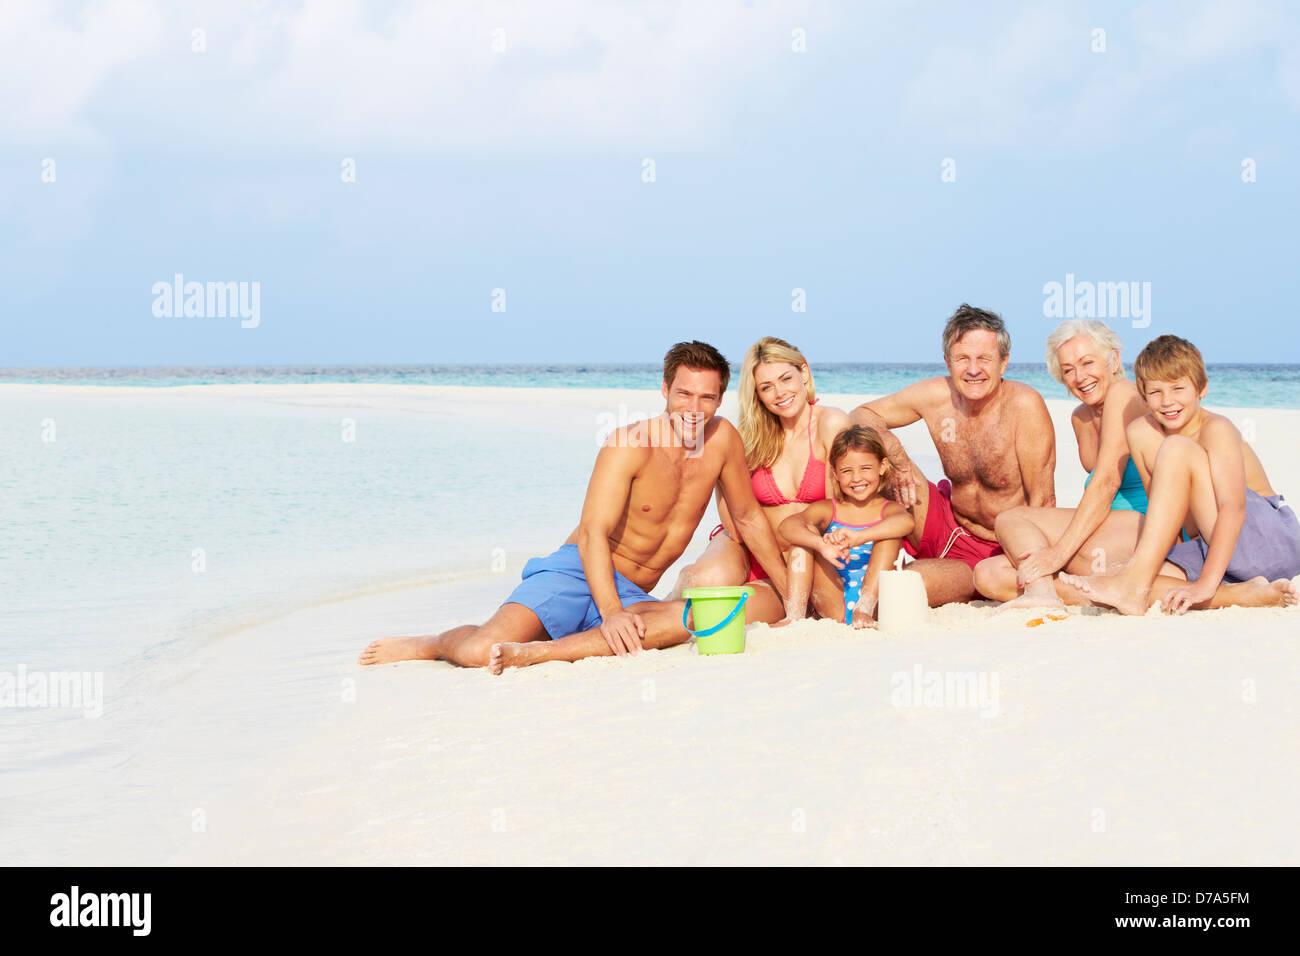 Multi Generation Family Having Fun On Beach Holiday - Stock Image